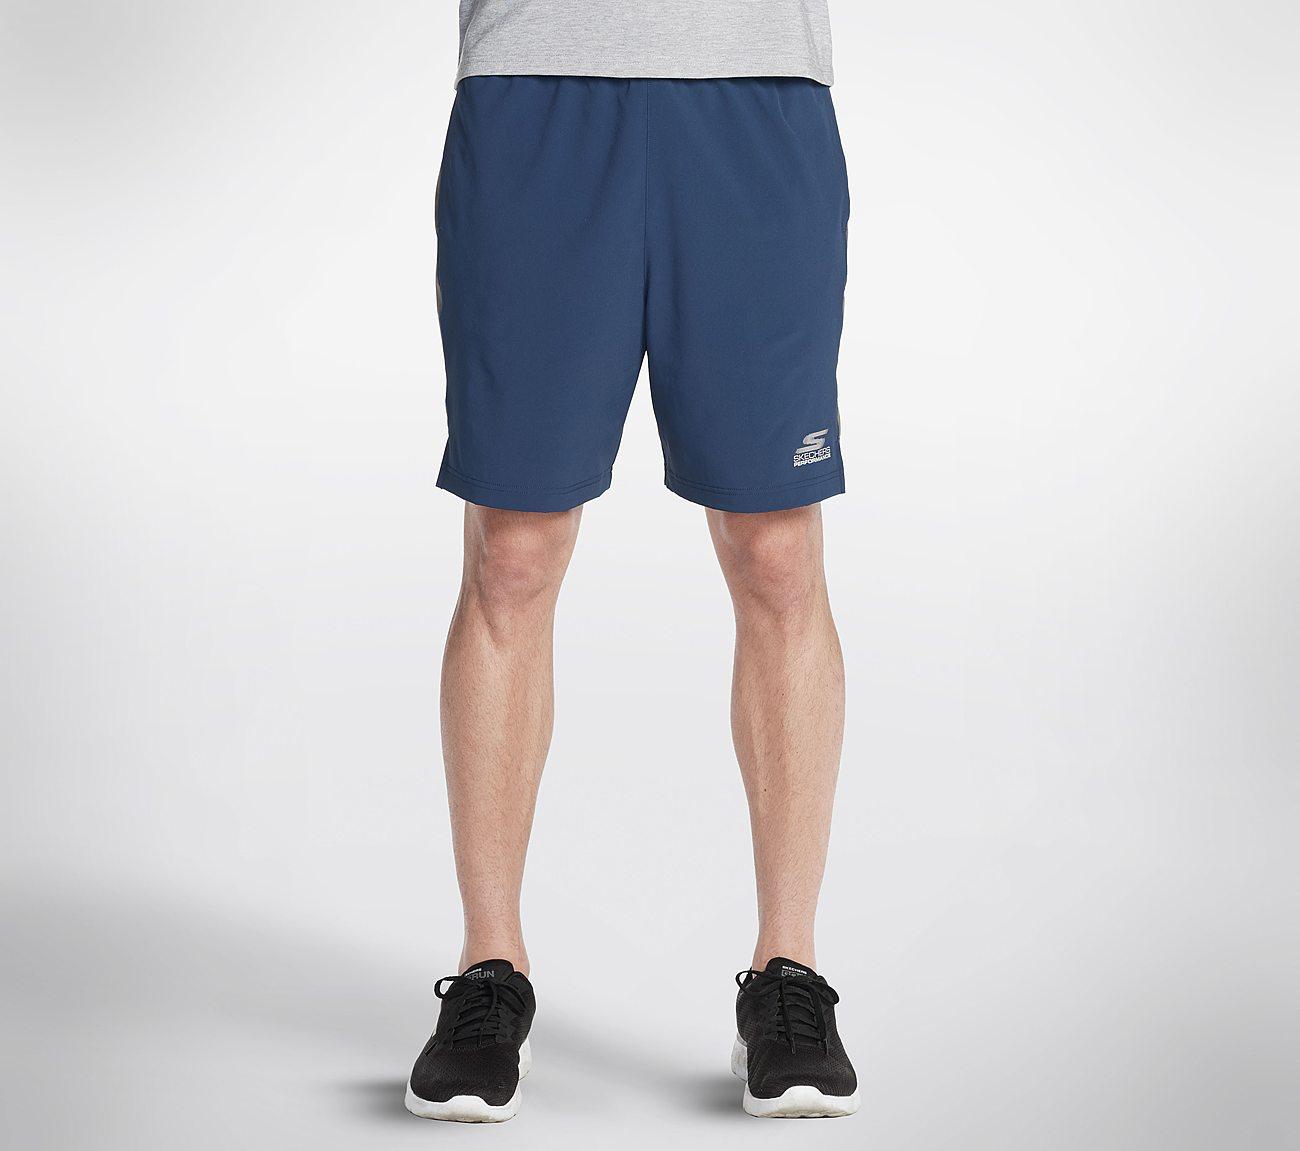 Motion 7 Inch Shorts